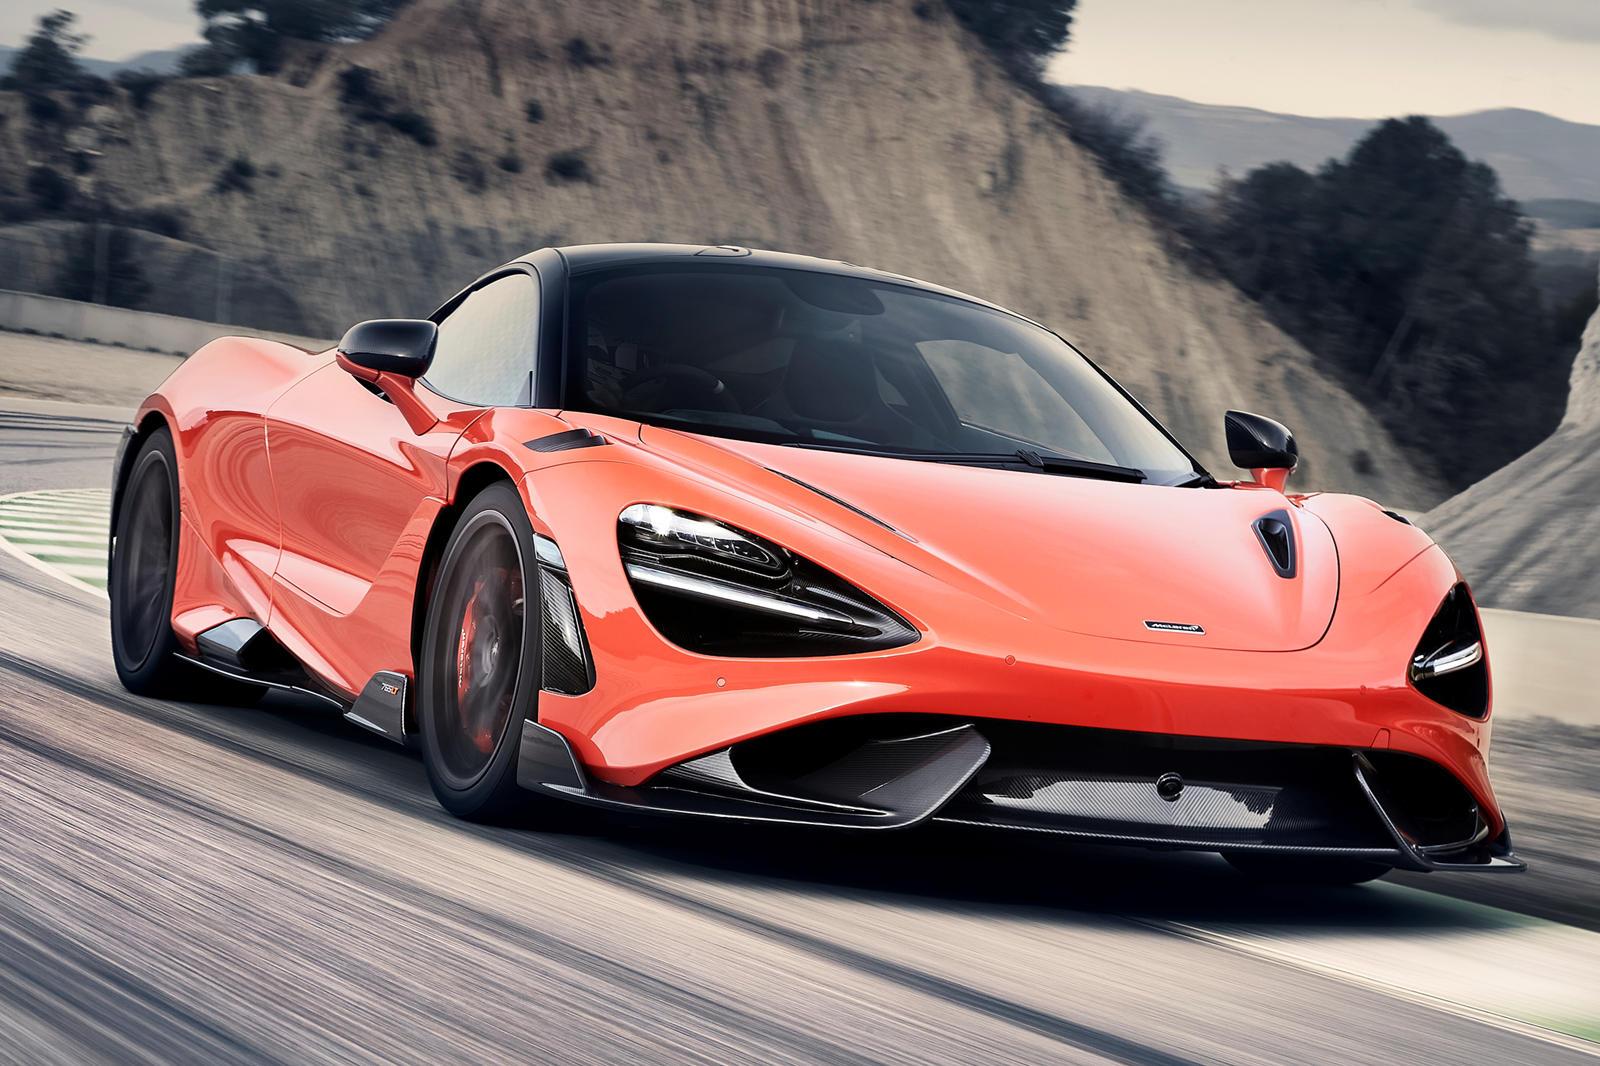 2021 McLaren 765LT: Review, Trims, Specs, Price, New Interior Features, Exterior Design, and Specifications